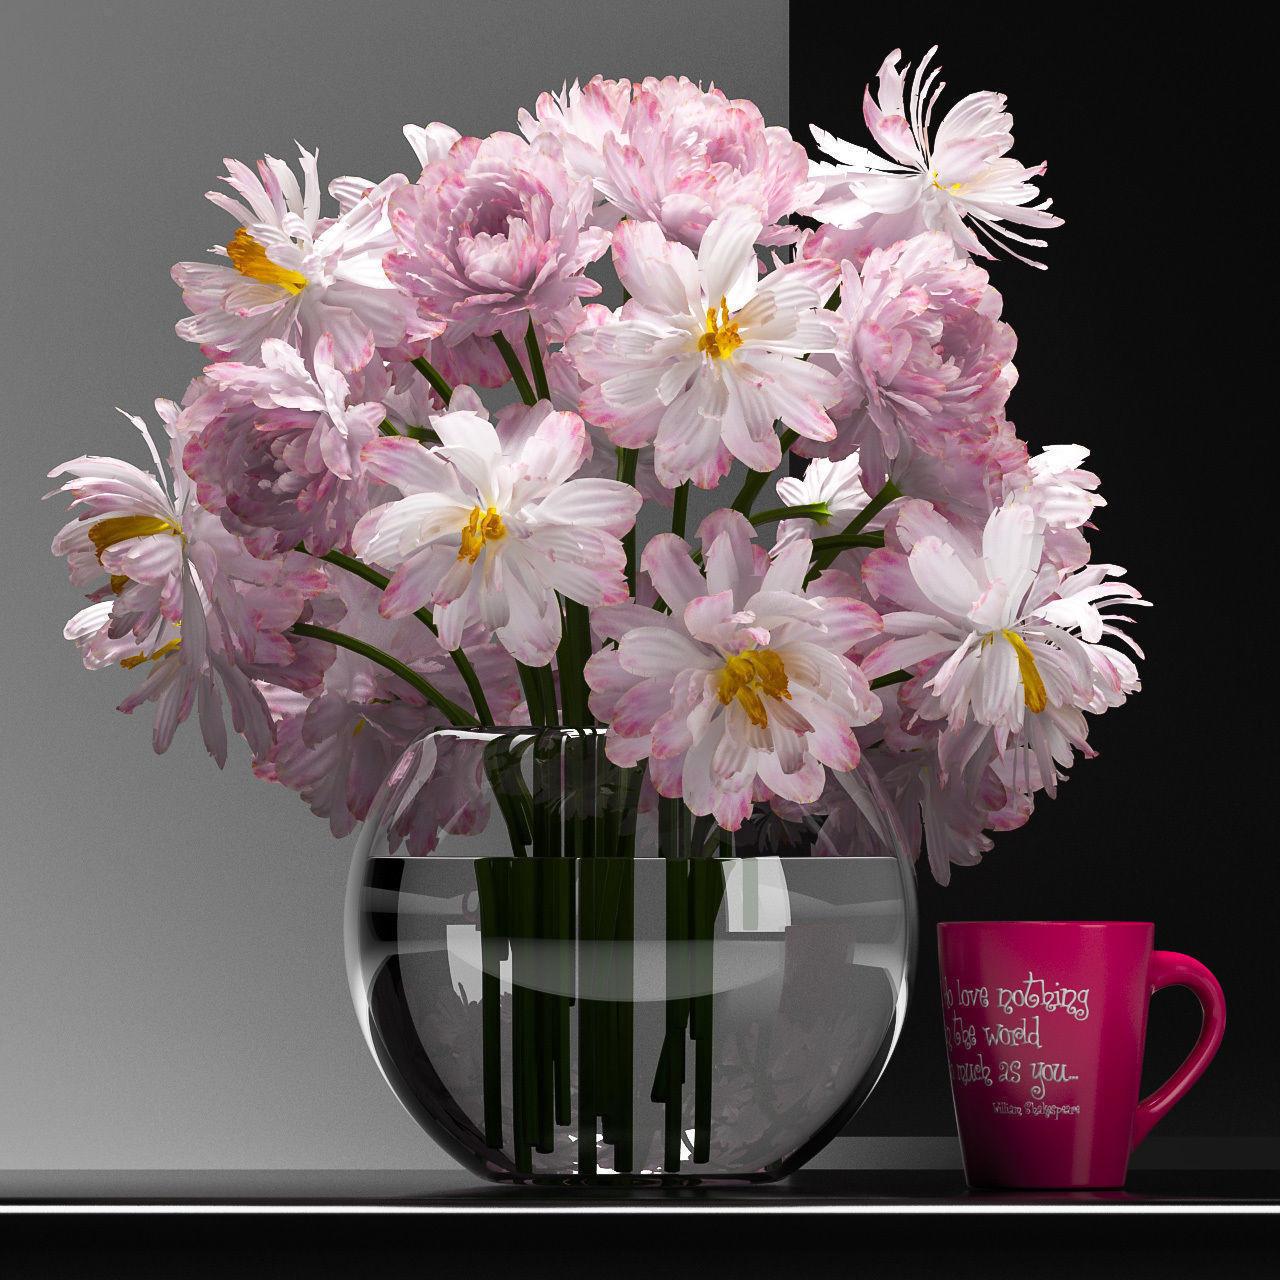 urn vases cheap of antique flower vase photograph antique vintage milk glass white vase with regard to antique flower vase collection wrh 20preview 2001h vases 3d flower vase preview 01 jpg i 0d